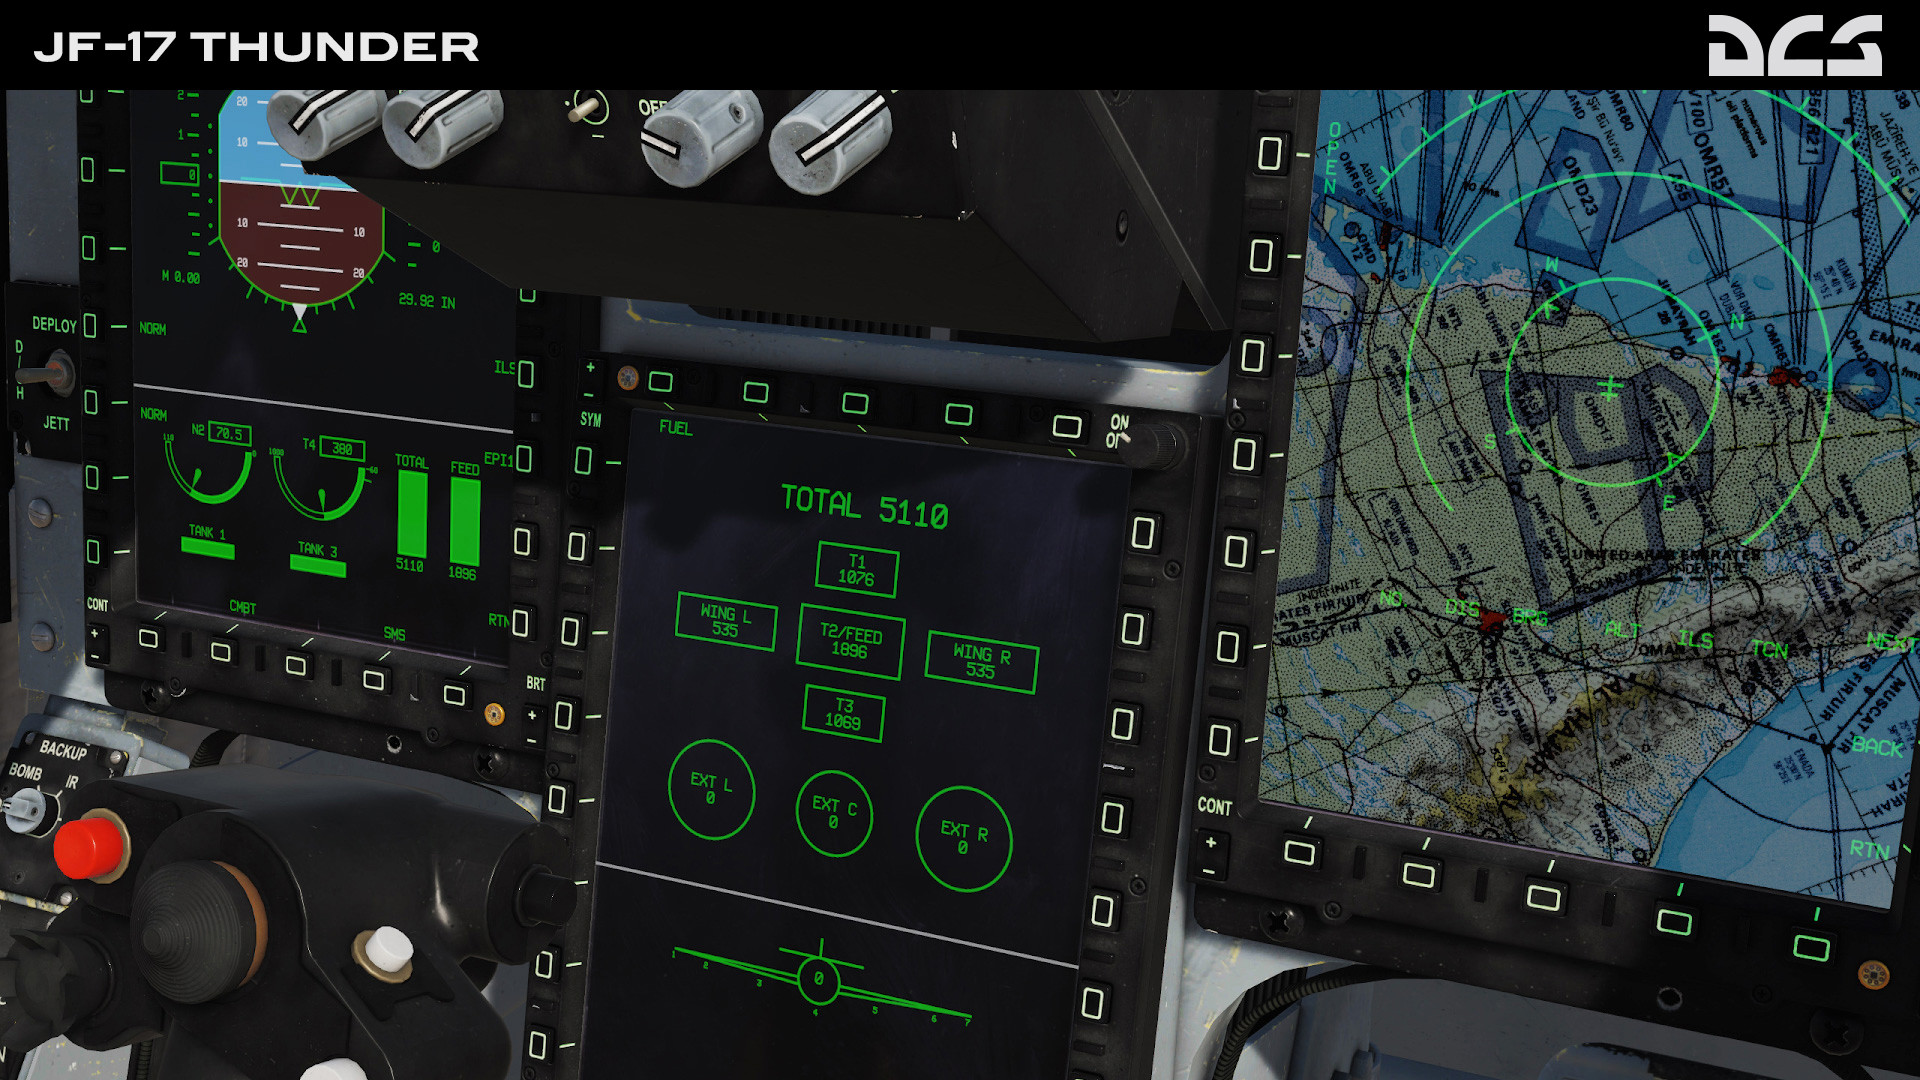 DCS: JF-17 Thunder PC Key Fiyatları